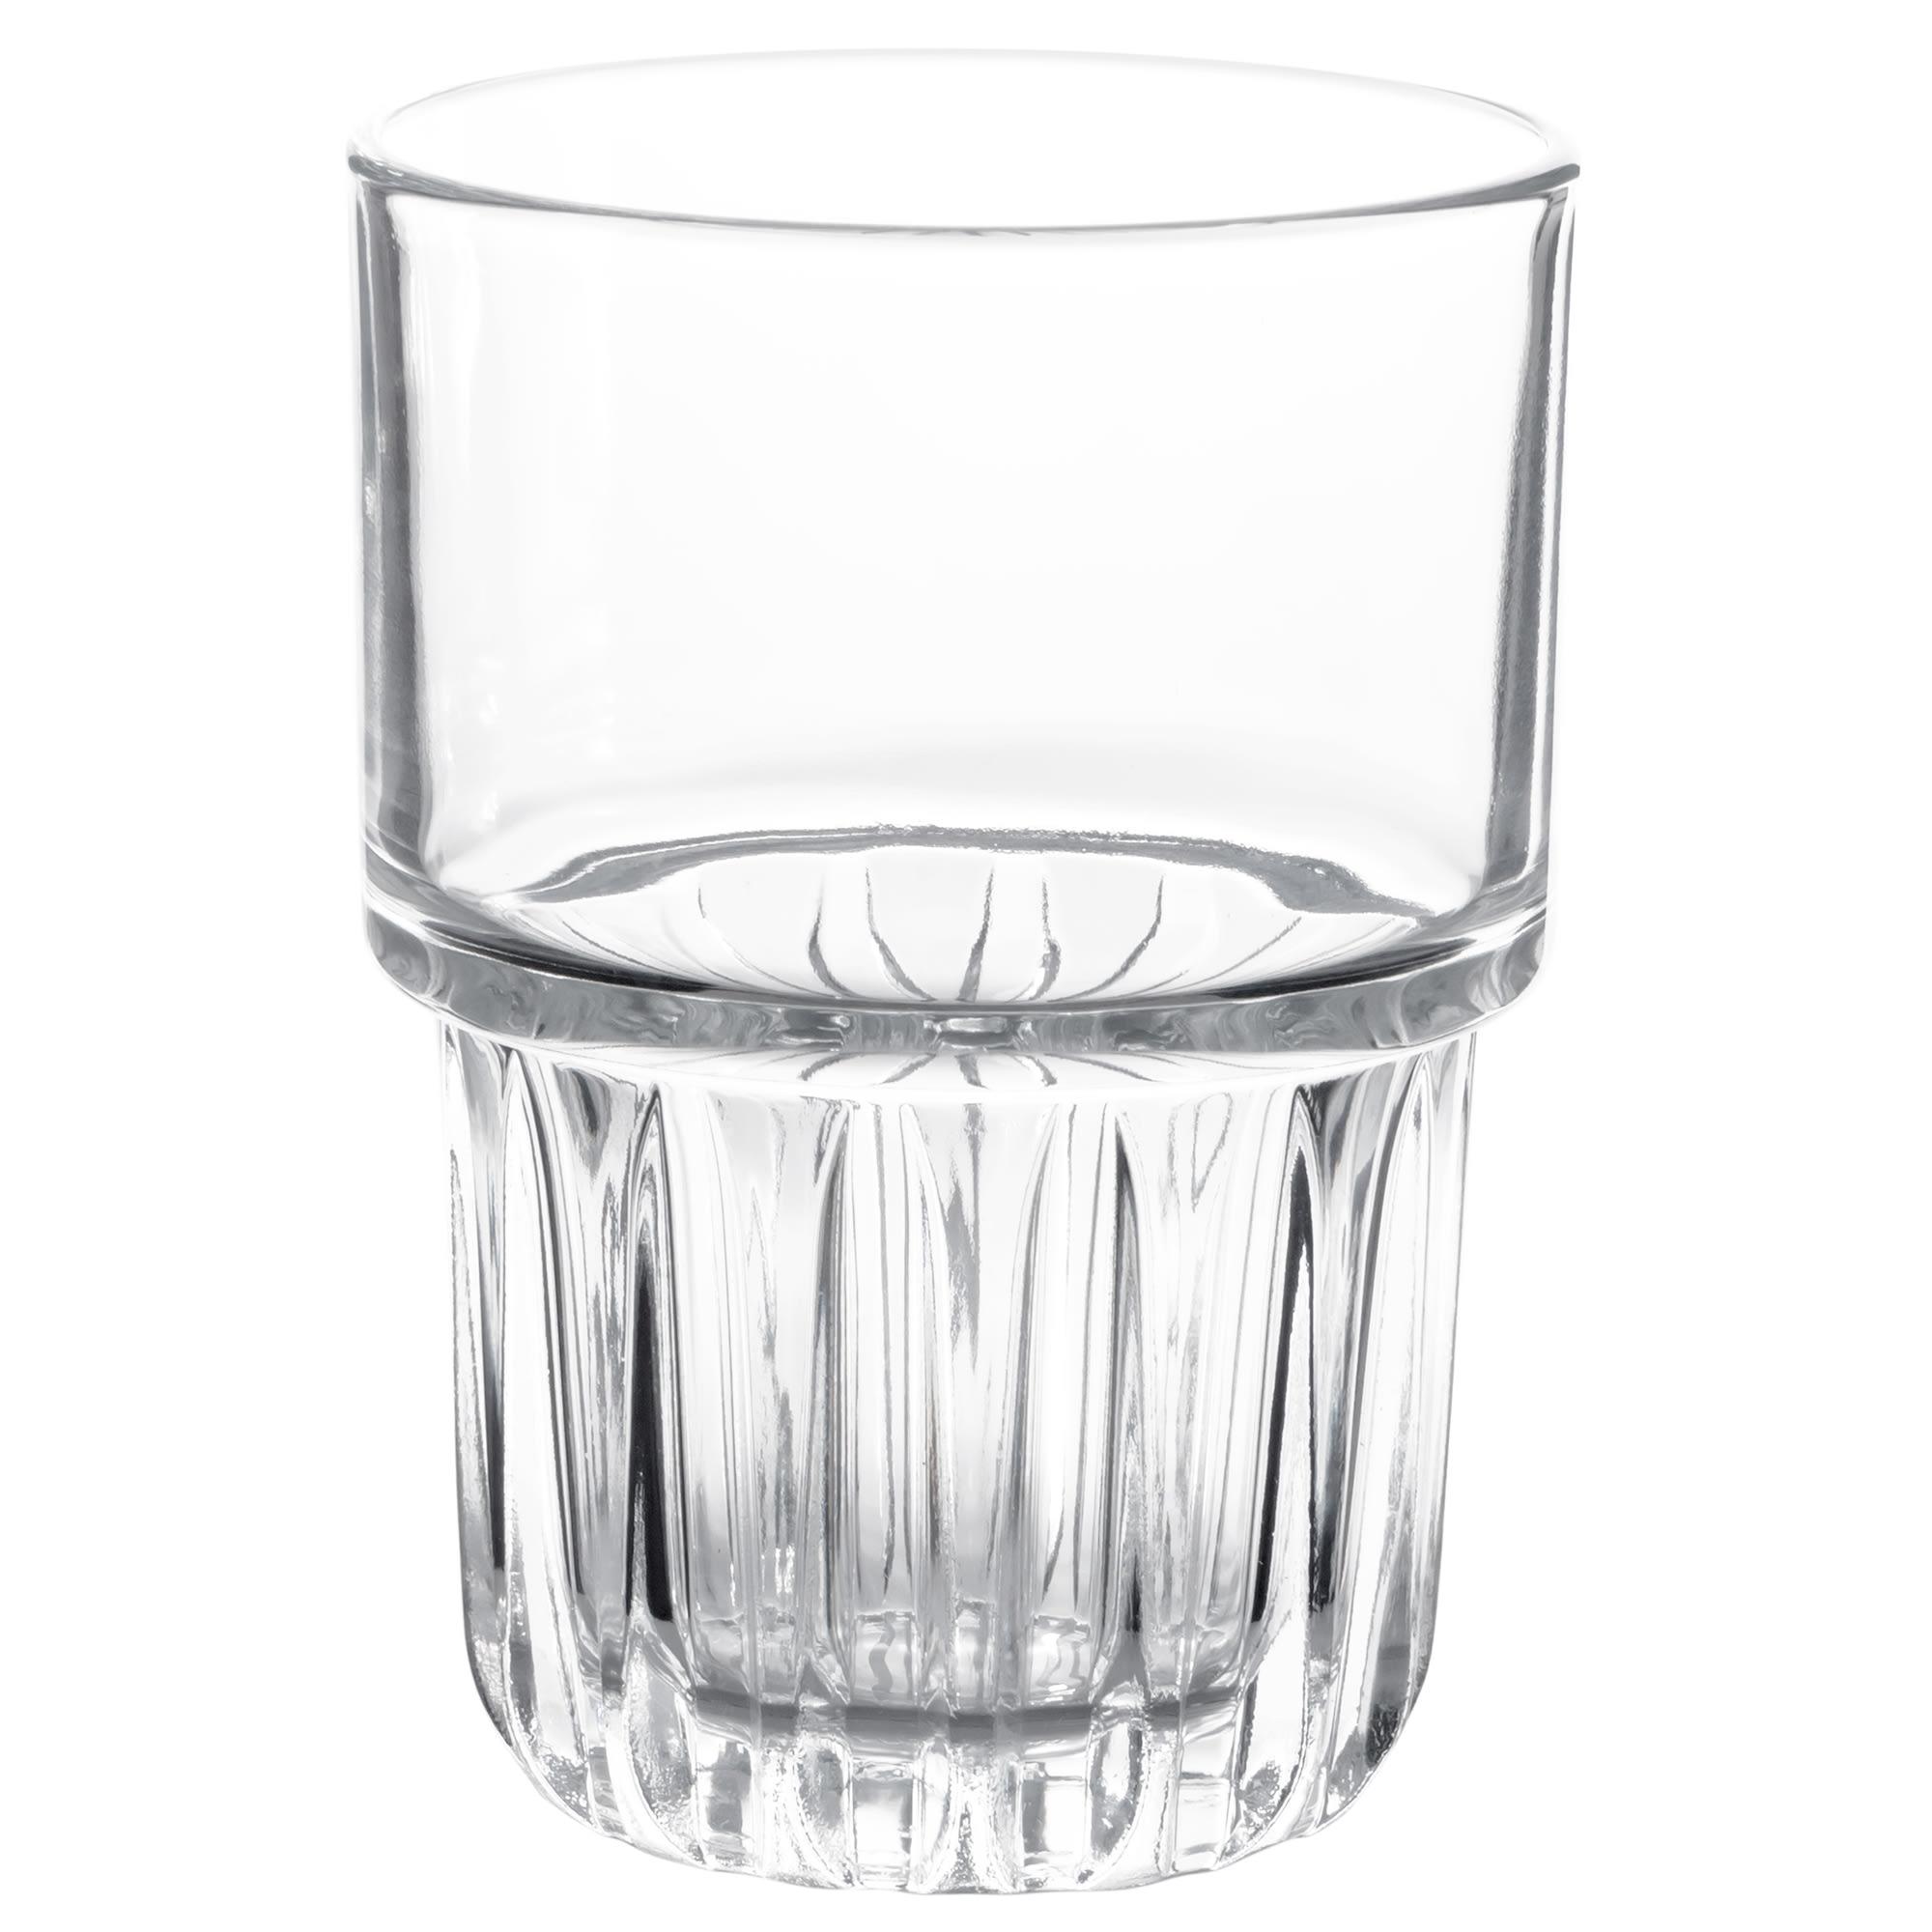 Libbey 15436 12-oz DuraTuff Everest Beverage Glass